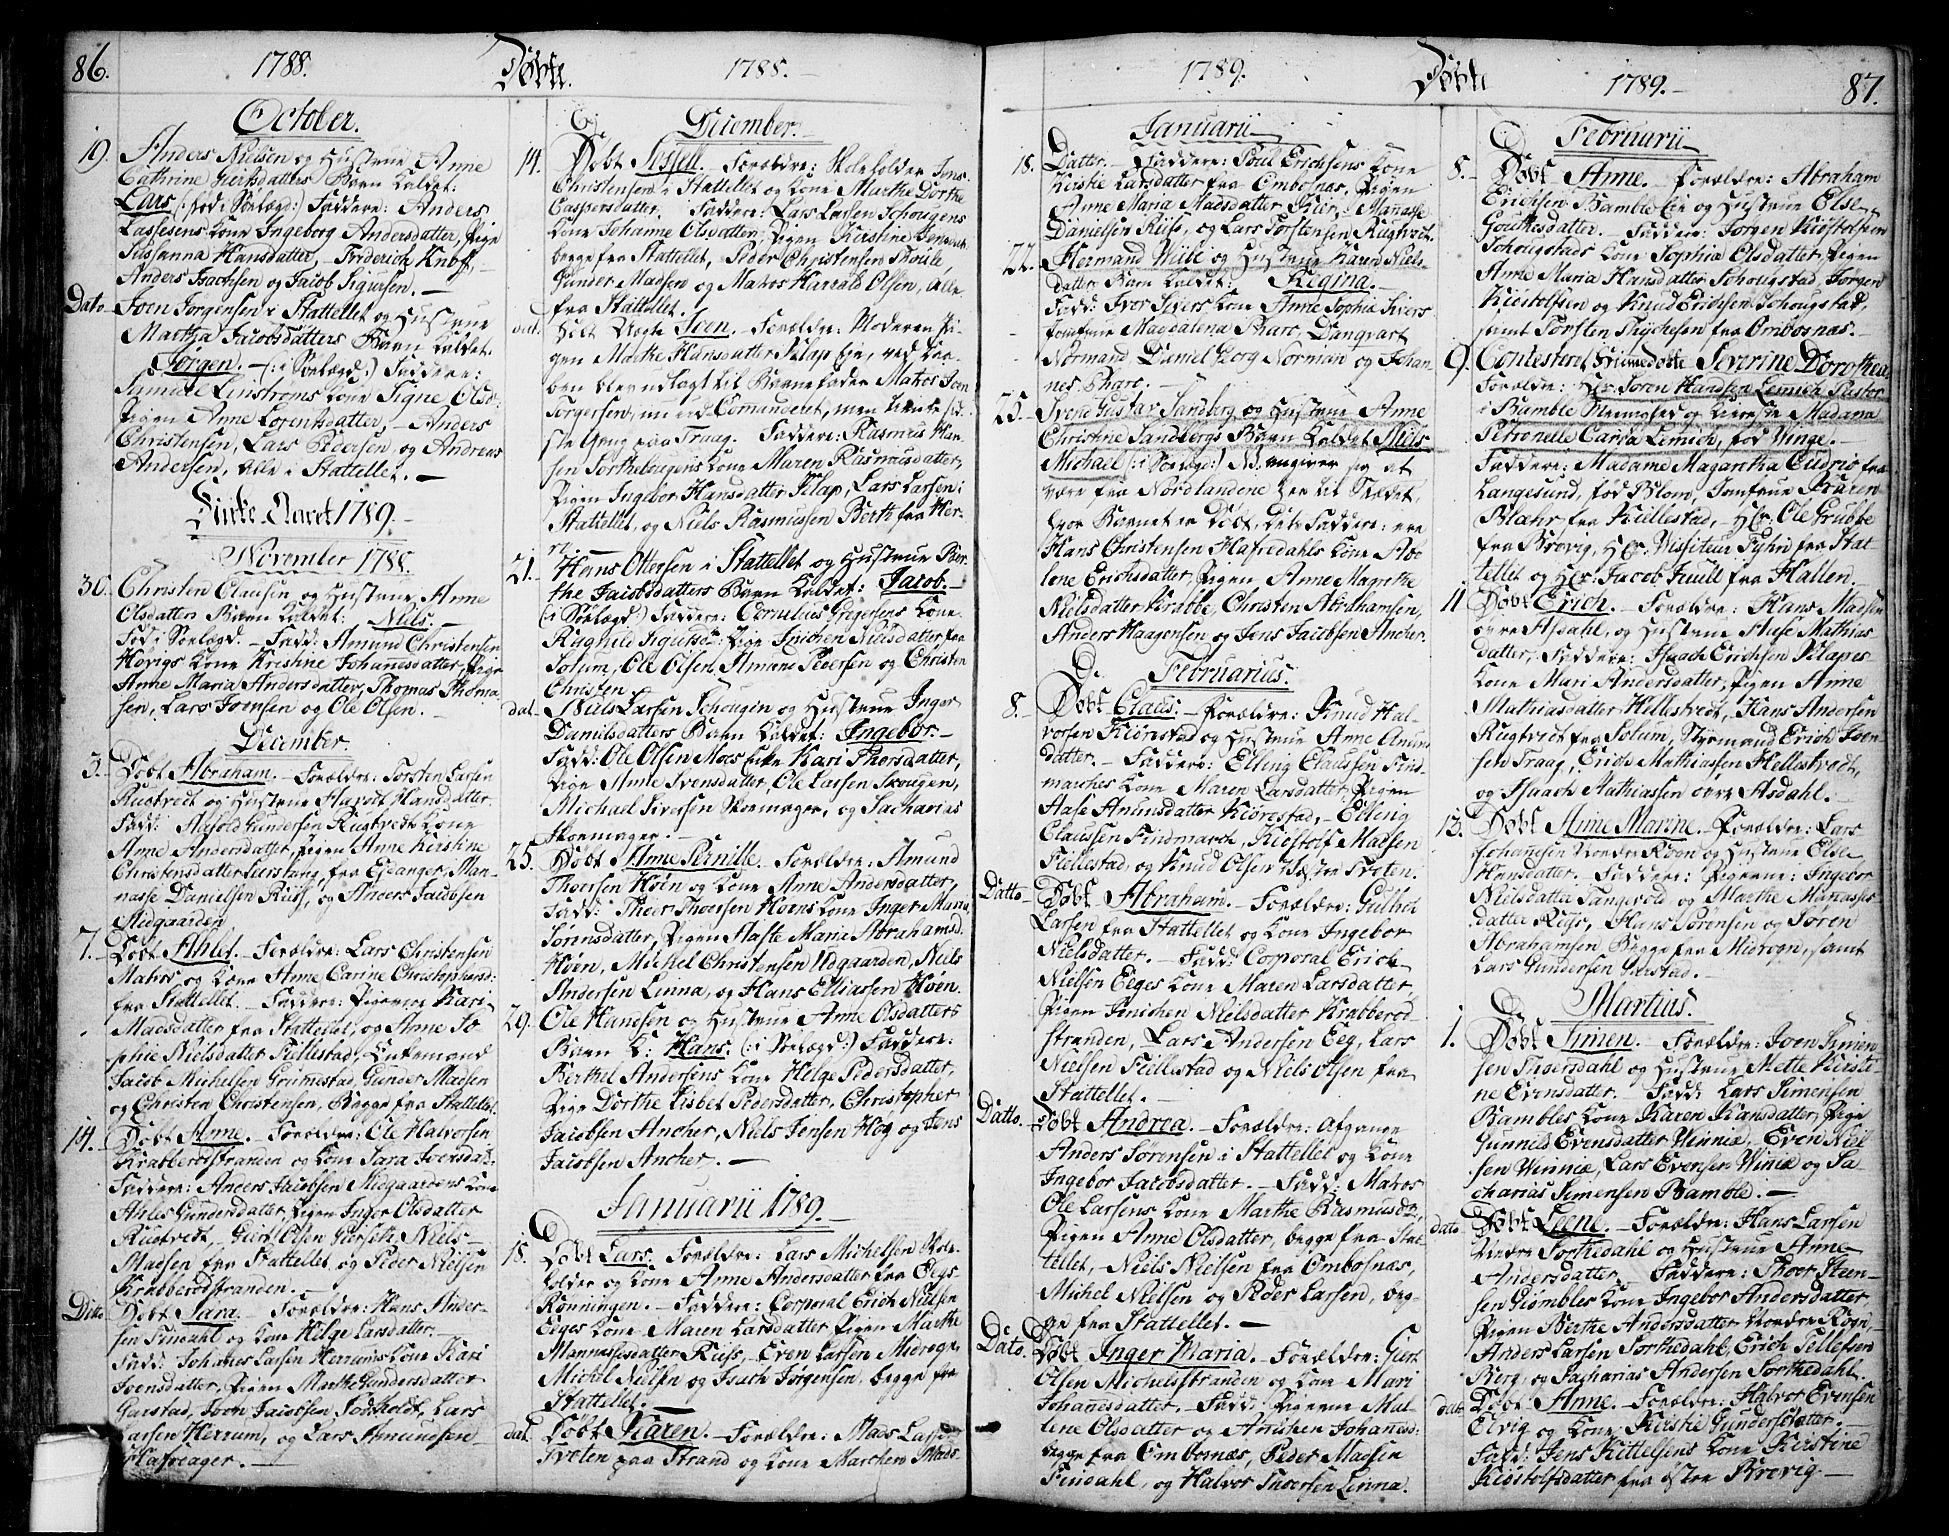 SAKO, Bamble kirkebøker, F/Fa/L0002: Ministerialbok nr. I 2, 1775-1814, s. 86-87